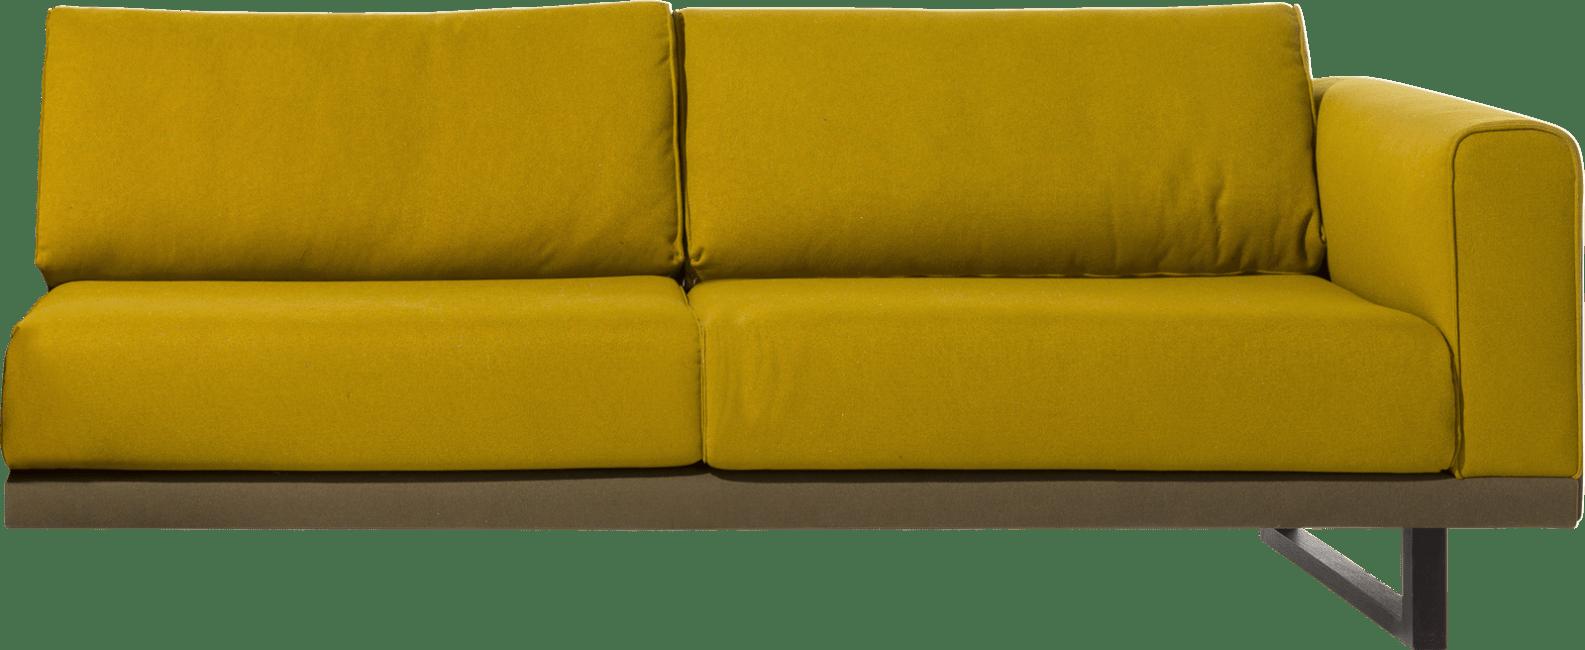 Silves - 2.5-sitzer armlehne rechts